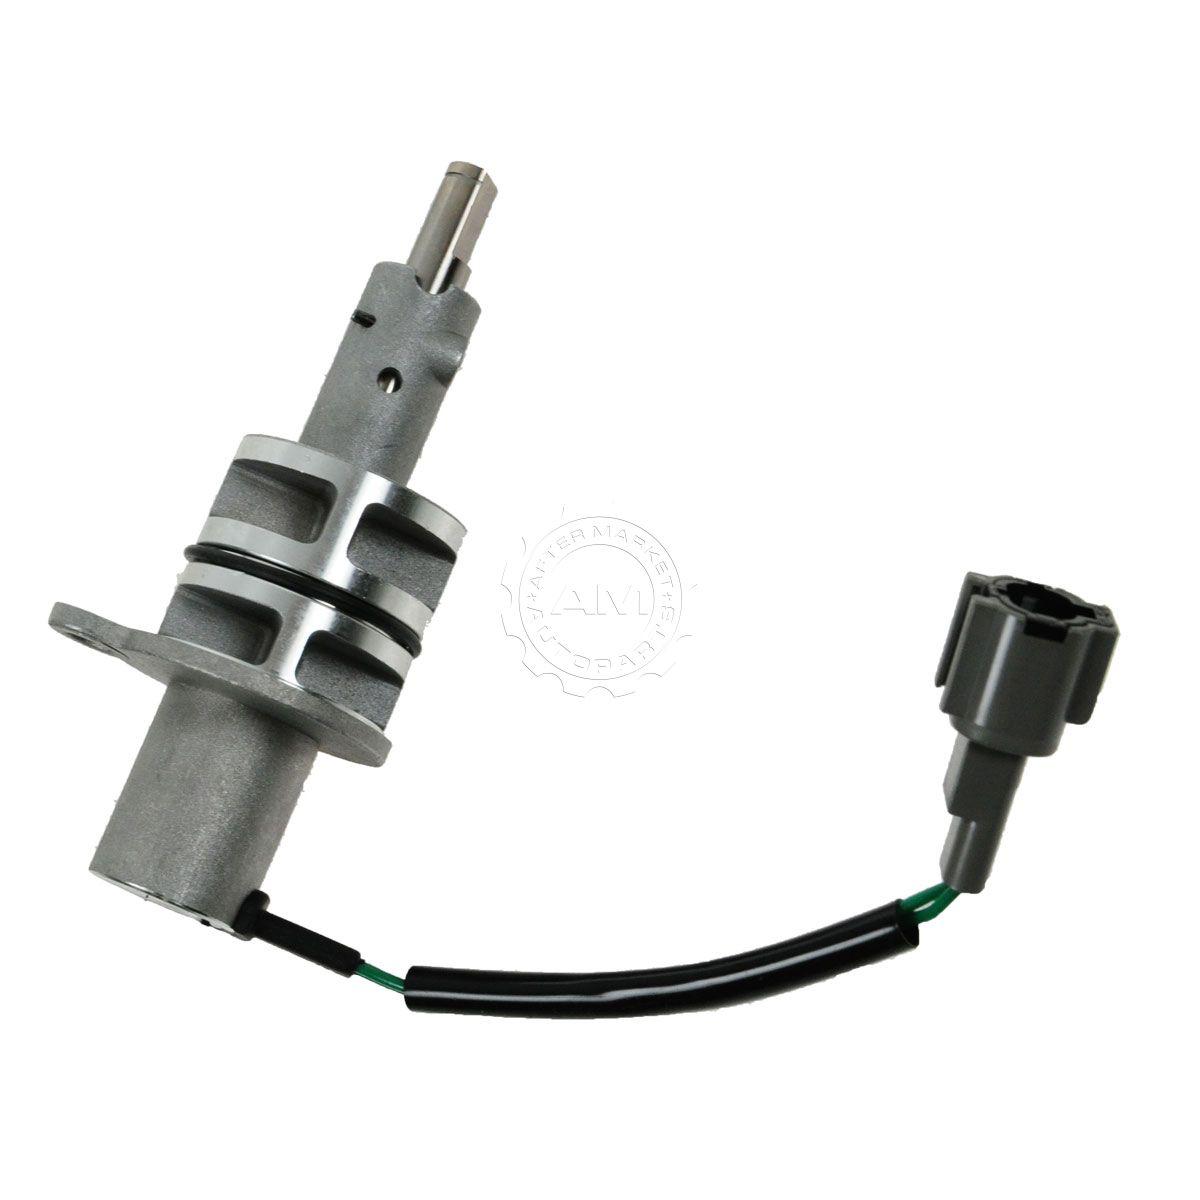 Vehicle Speed Sensor VSS L4 1.6L For 93-94 Nissan Sentra w/ Manual